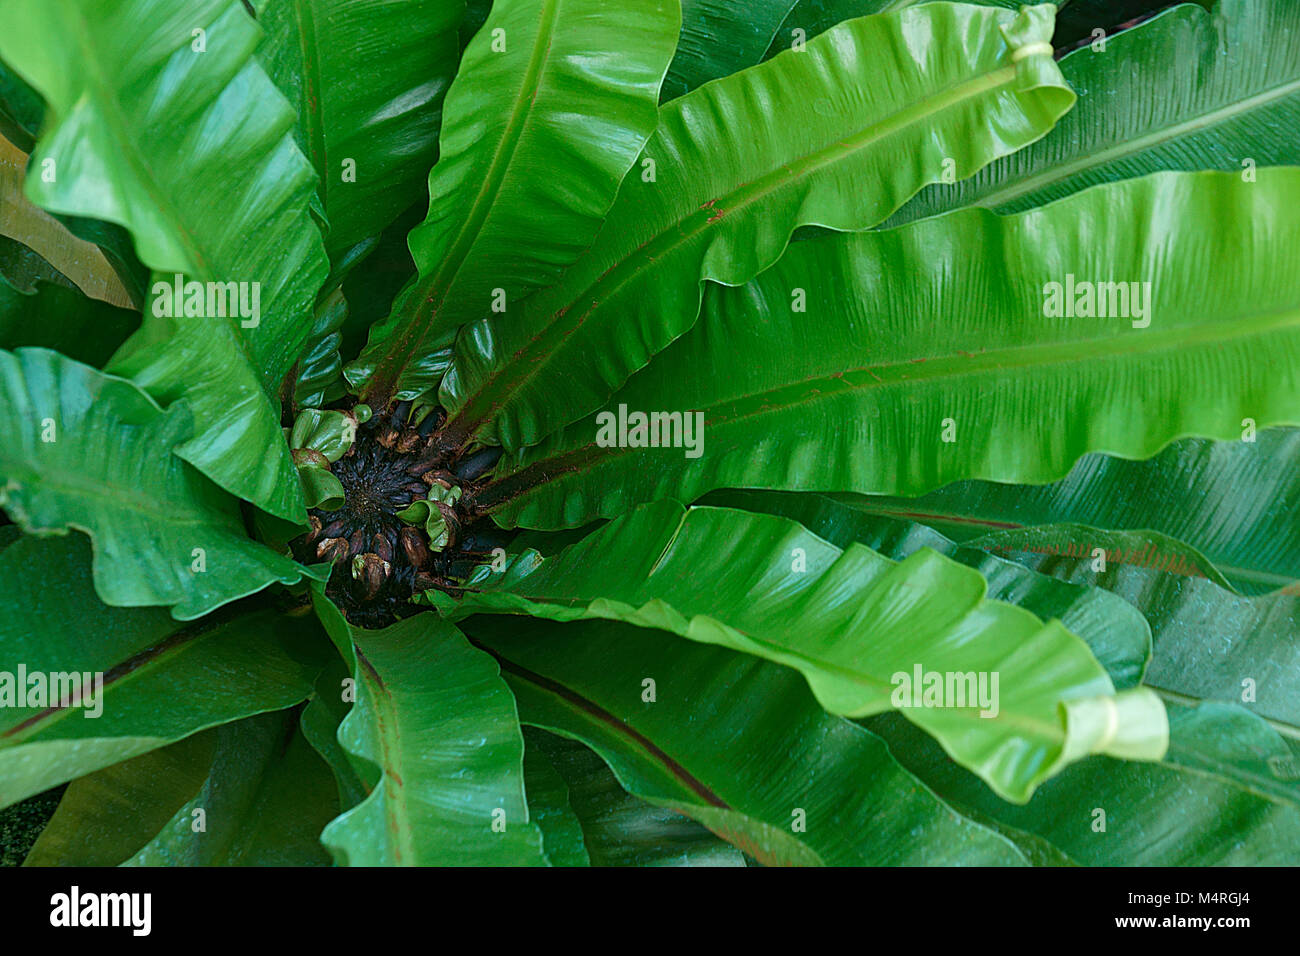 Taiwan cycad (Cycas taiwaniana) - Stock Image